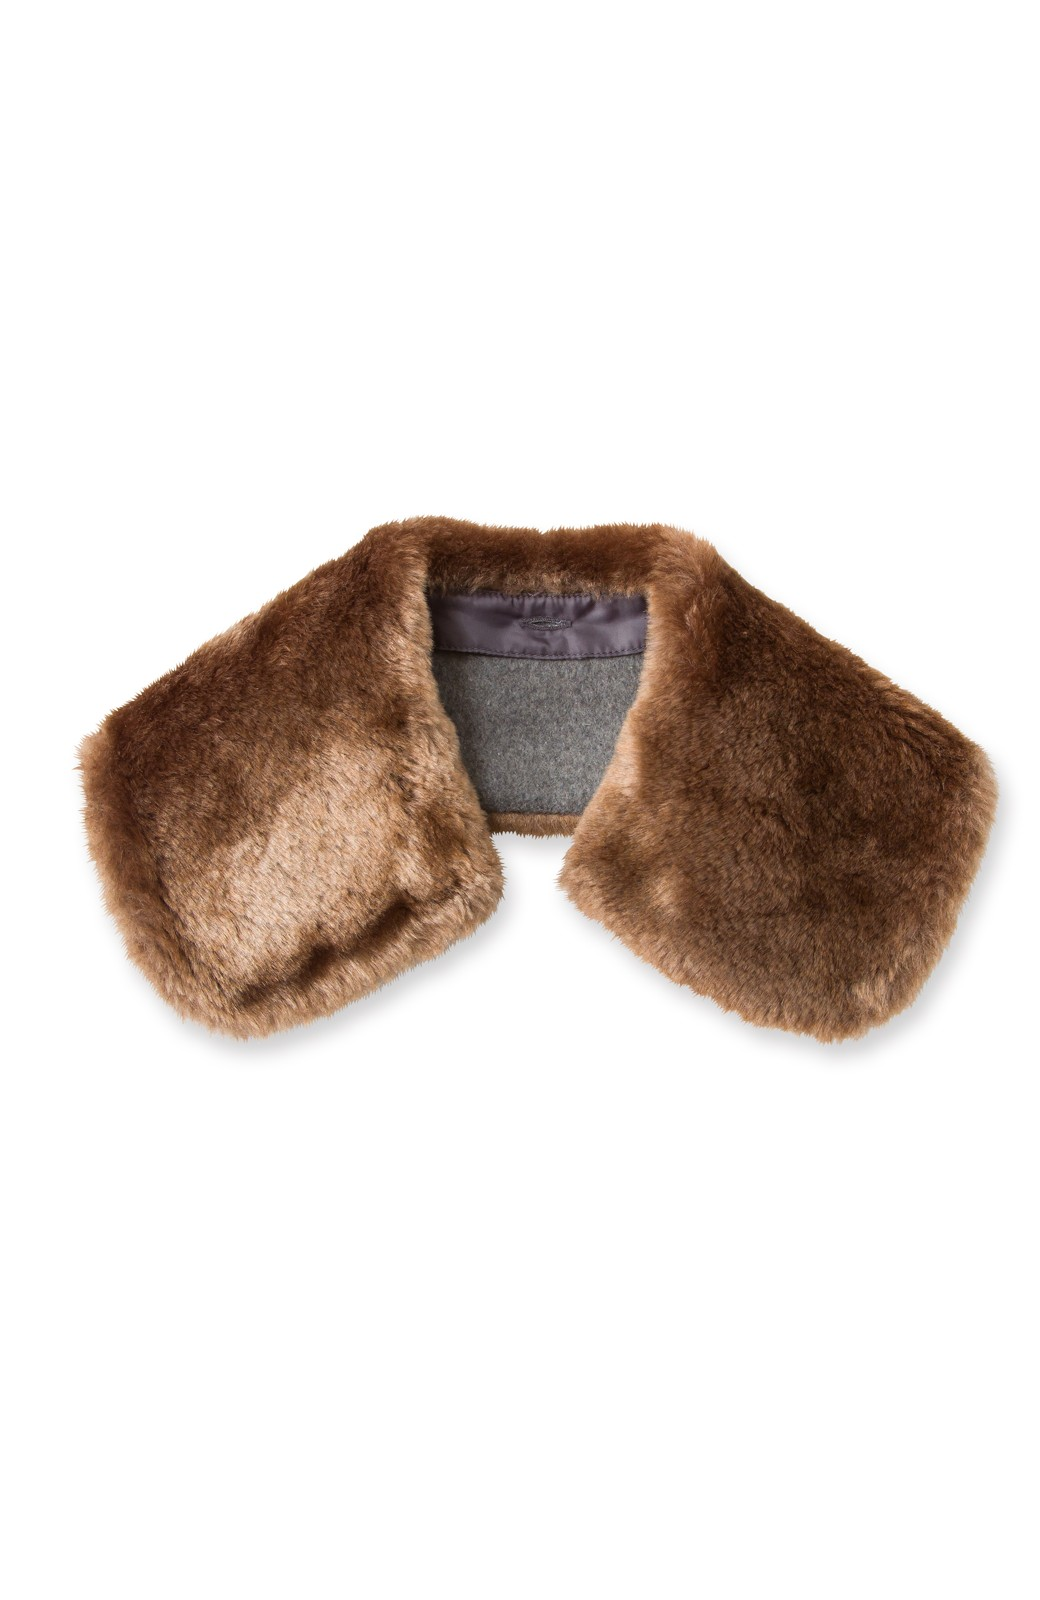 pilvee 取り外しフェイクファー衿付き ウール混のノーカラーコート <グレー>の商品写真6